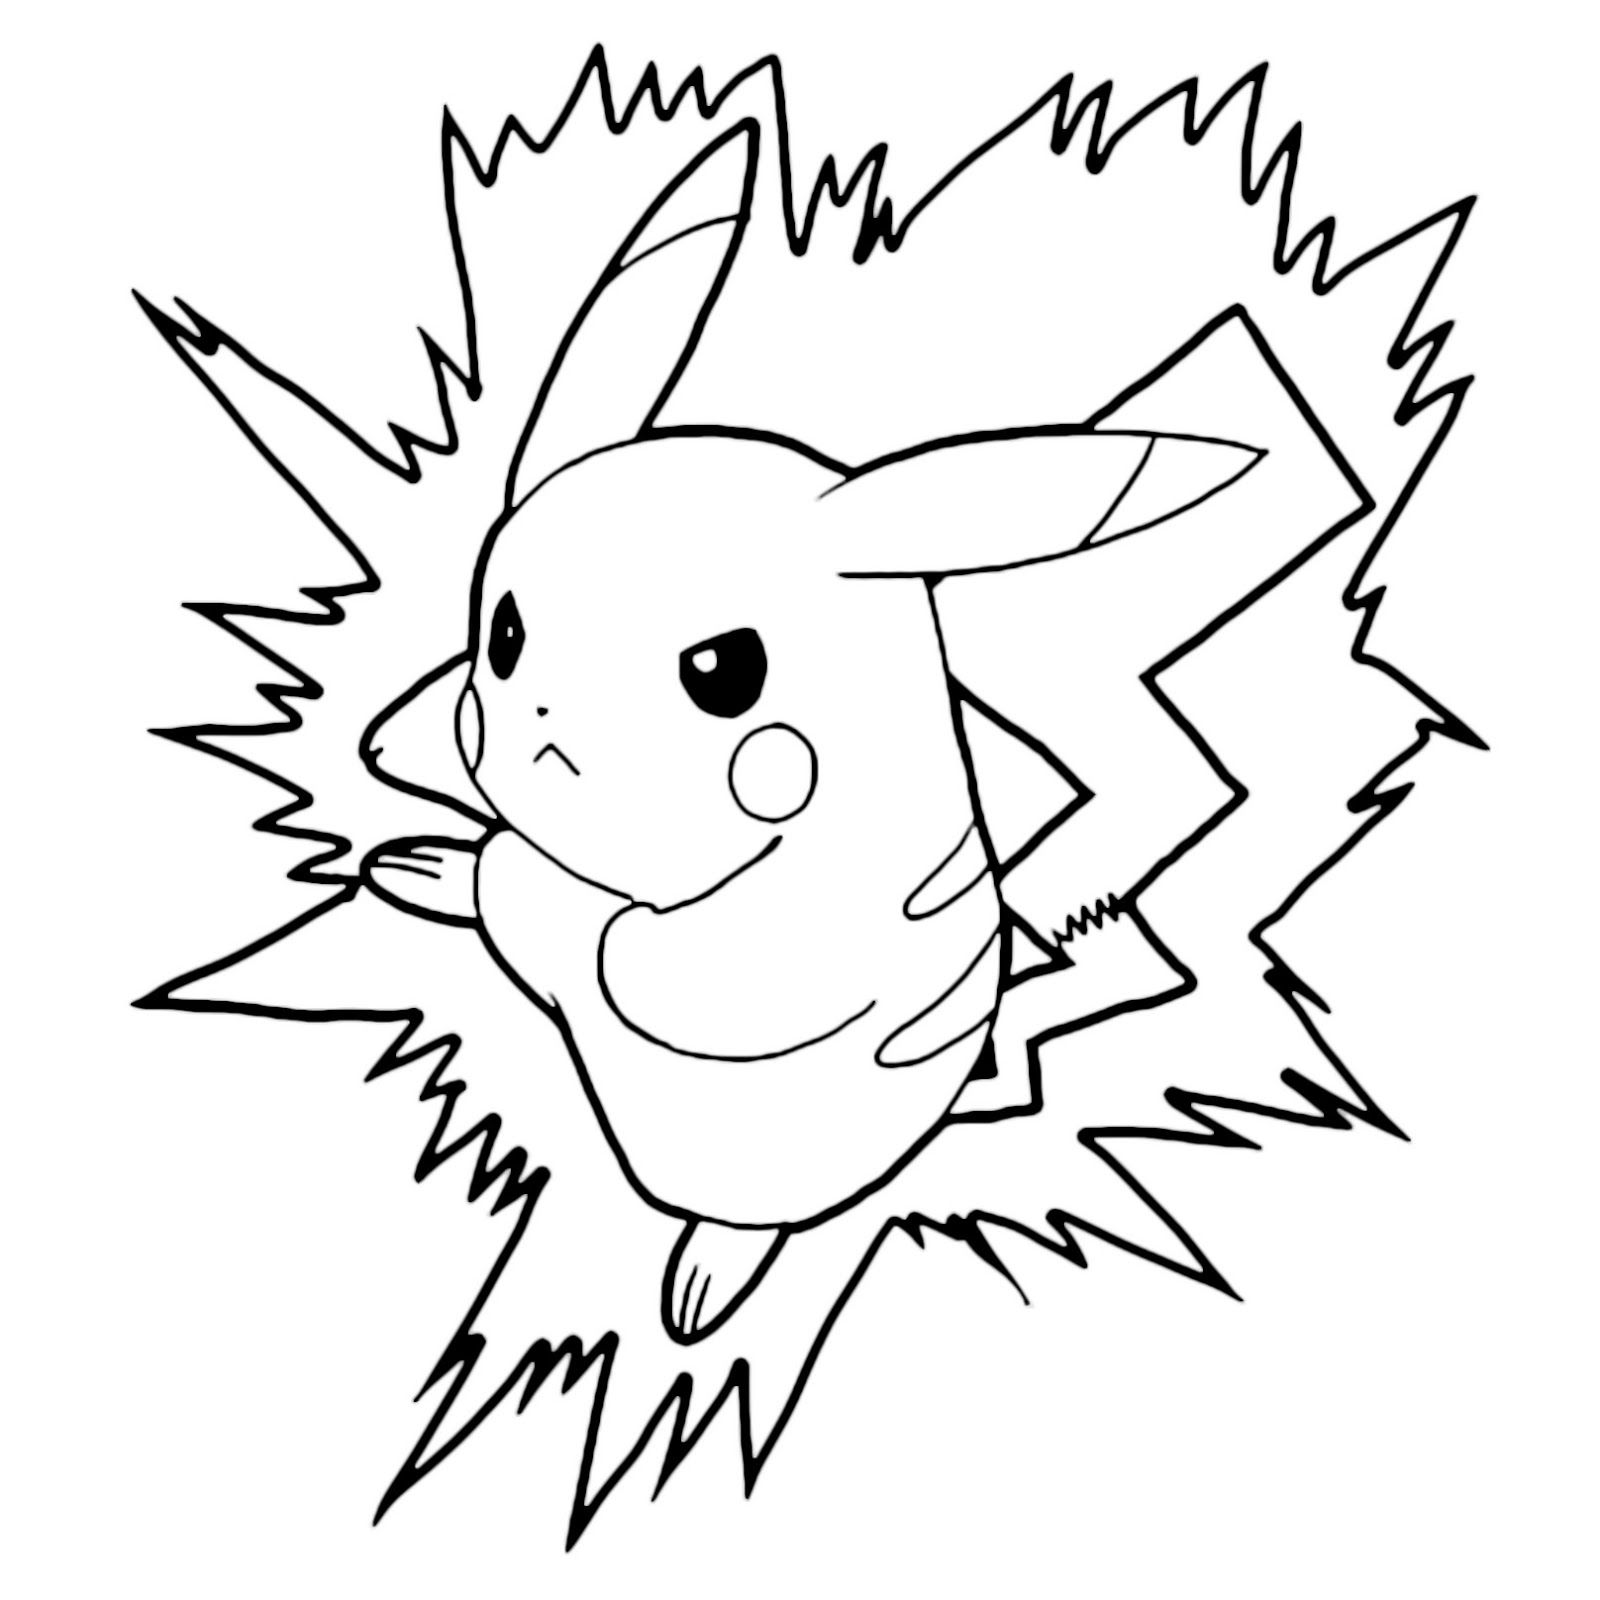 Angry Pokemon Pikachu Lightning Bolt Attack Coloring Pages Pikachu Coloring Page Pokemon Coloring Pages Pokemon Coloring Sheets